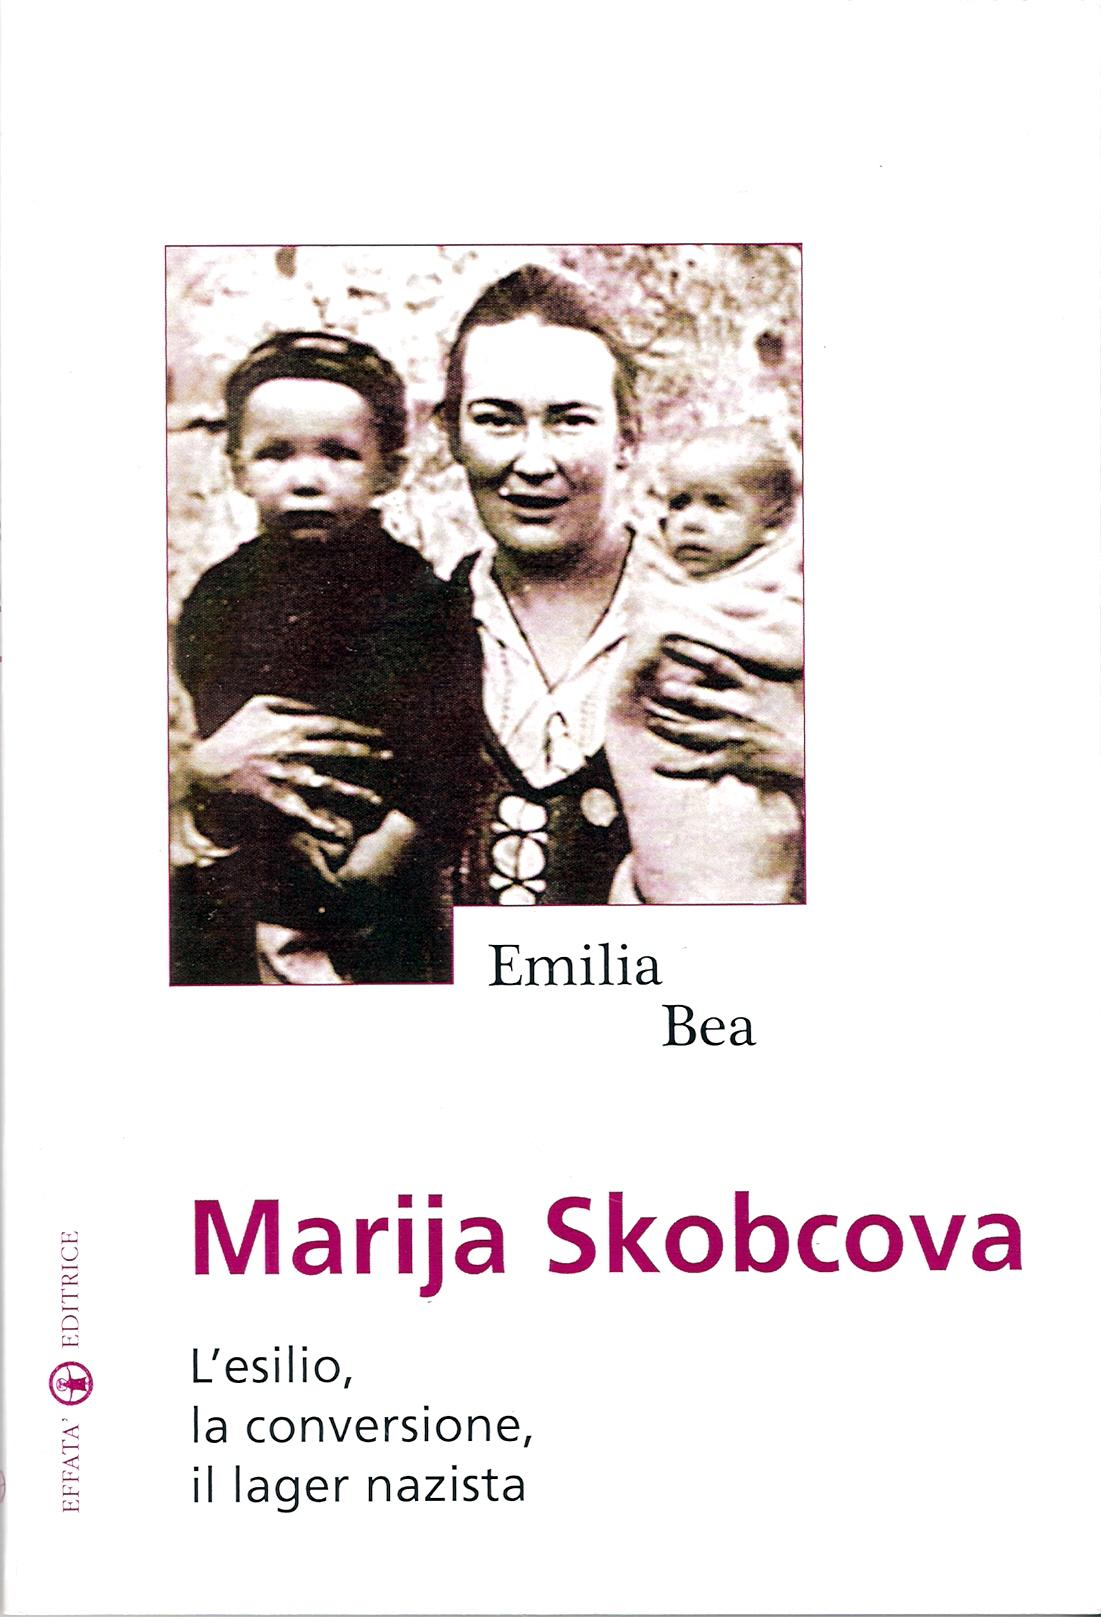 Marija Skobcova